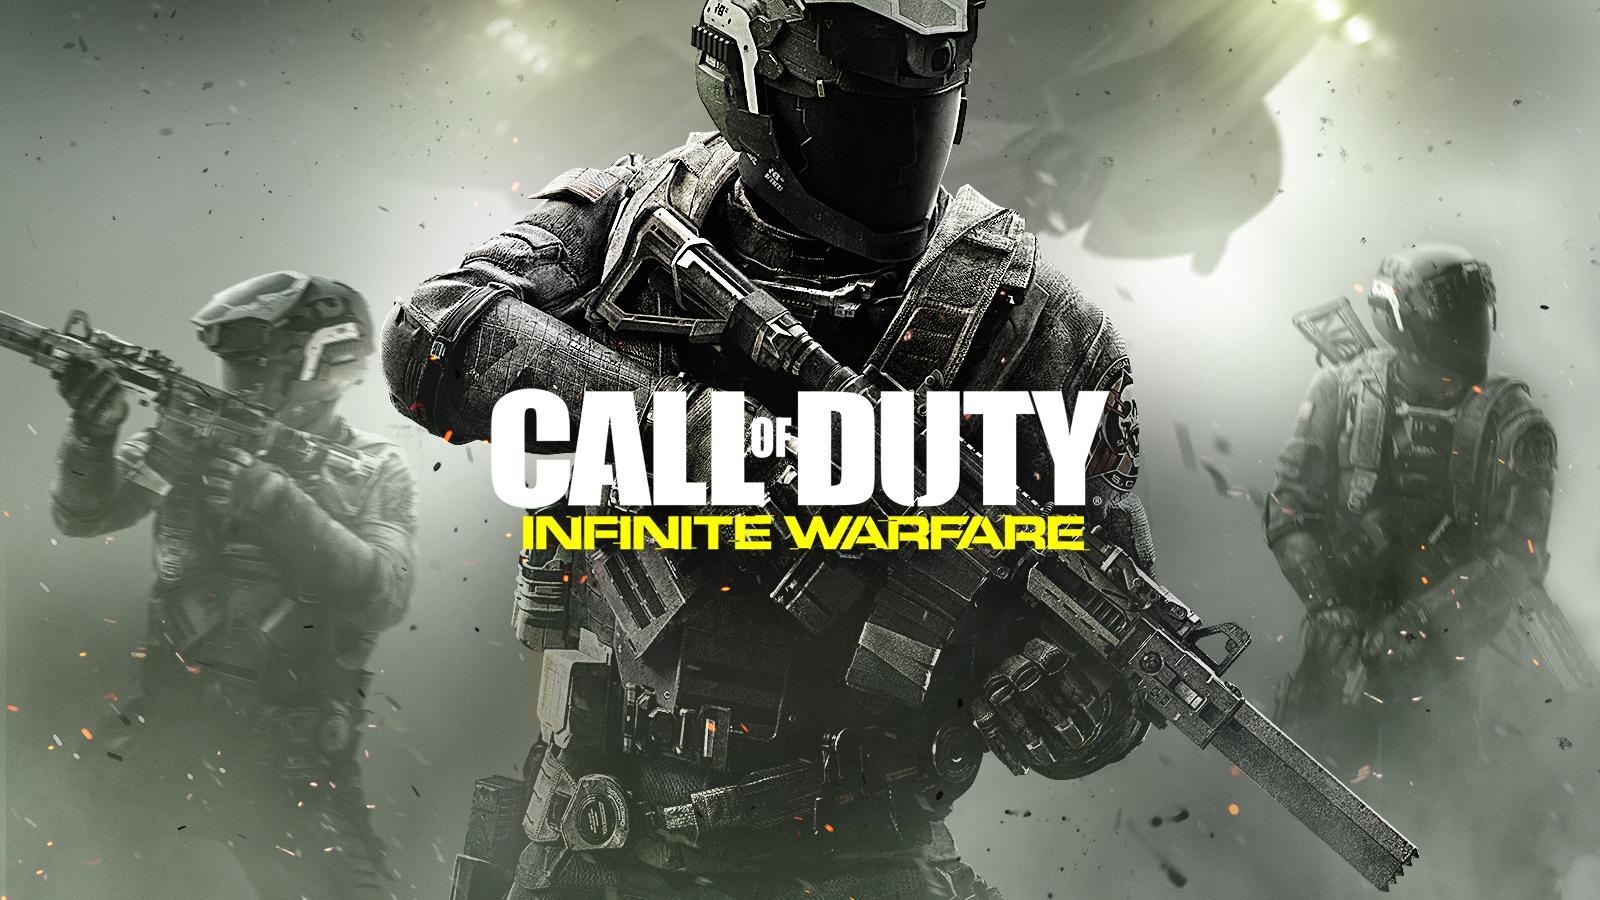 Call of Duty: İnfinite Warfare Shaolin Shuffle Eklentisi Tanıtım Videosu resimi